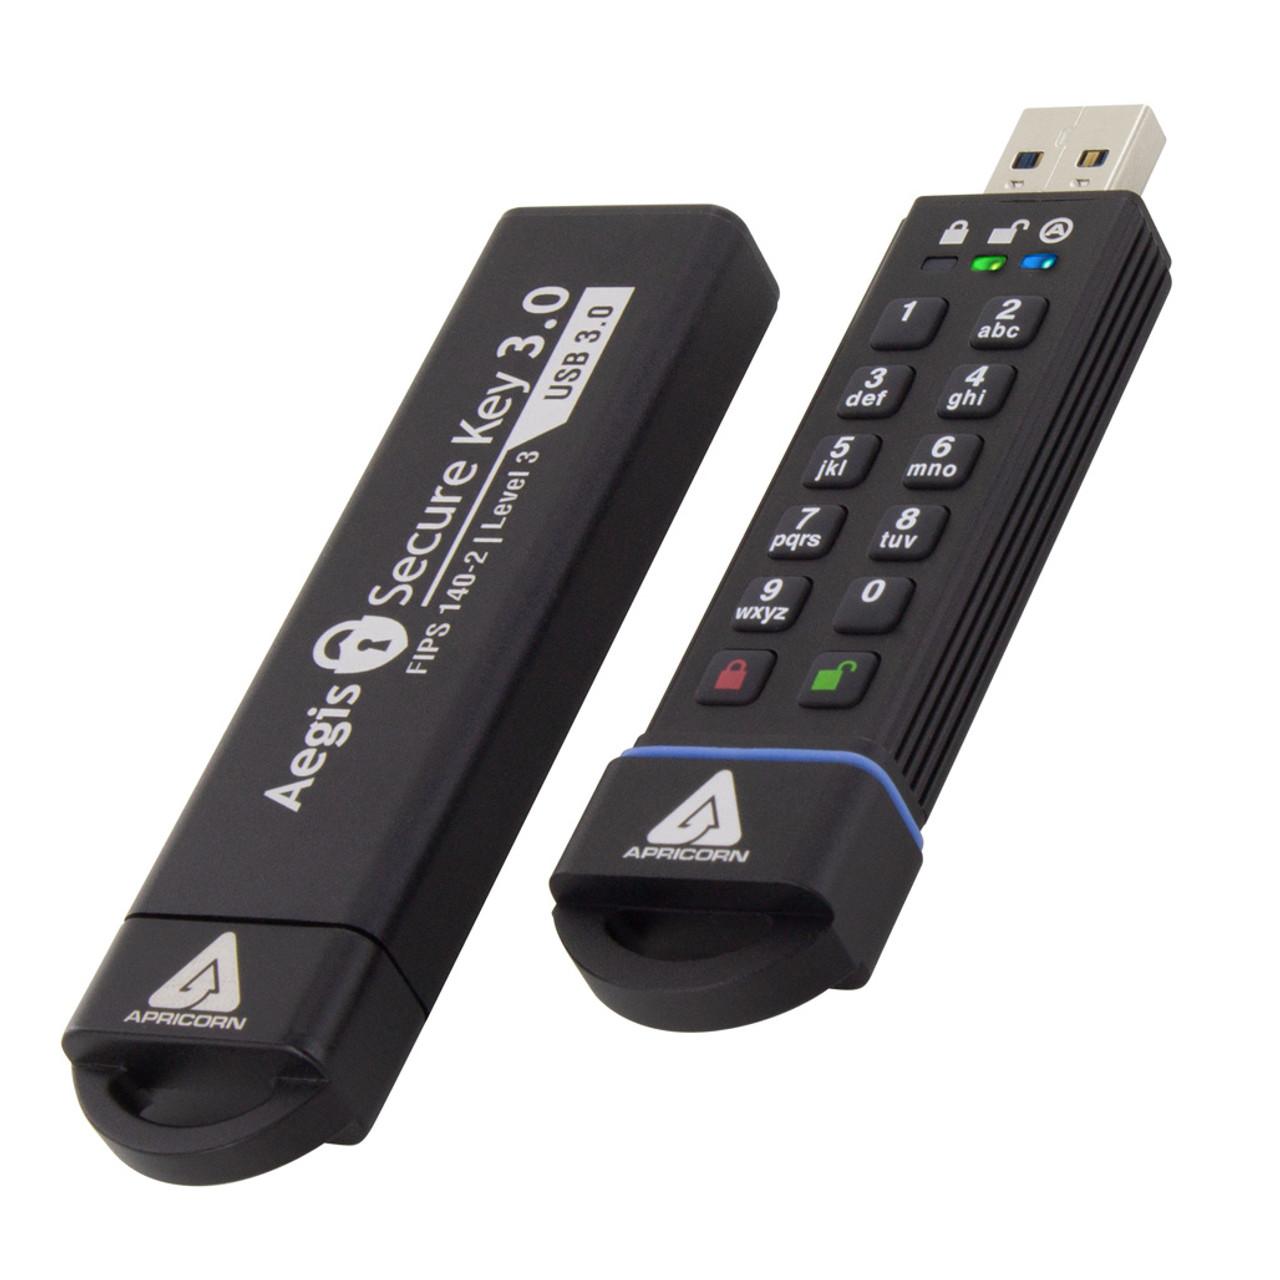 Mac portable ac recover recharge ac machine model -ac500 manual user